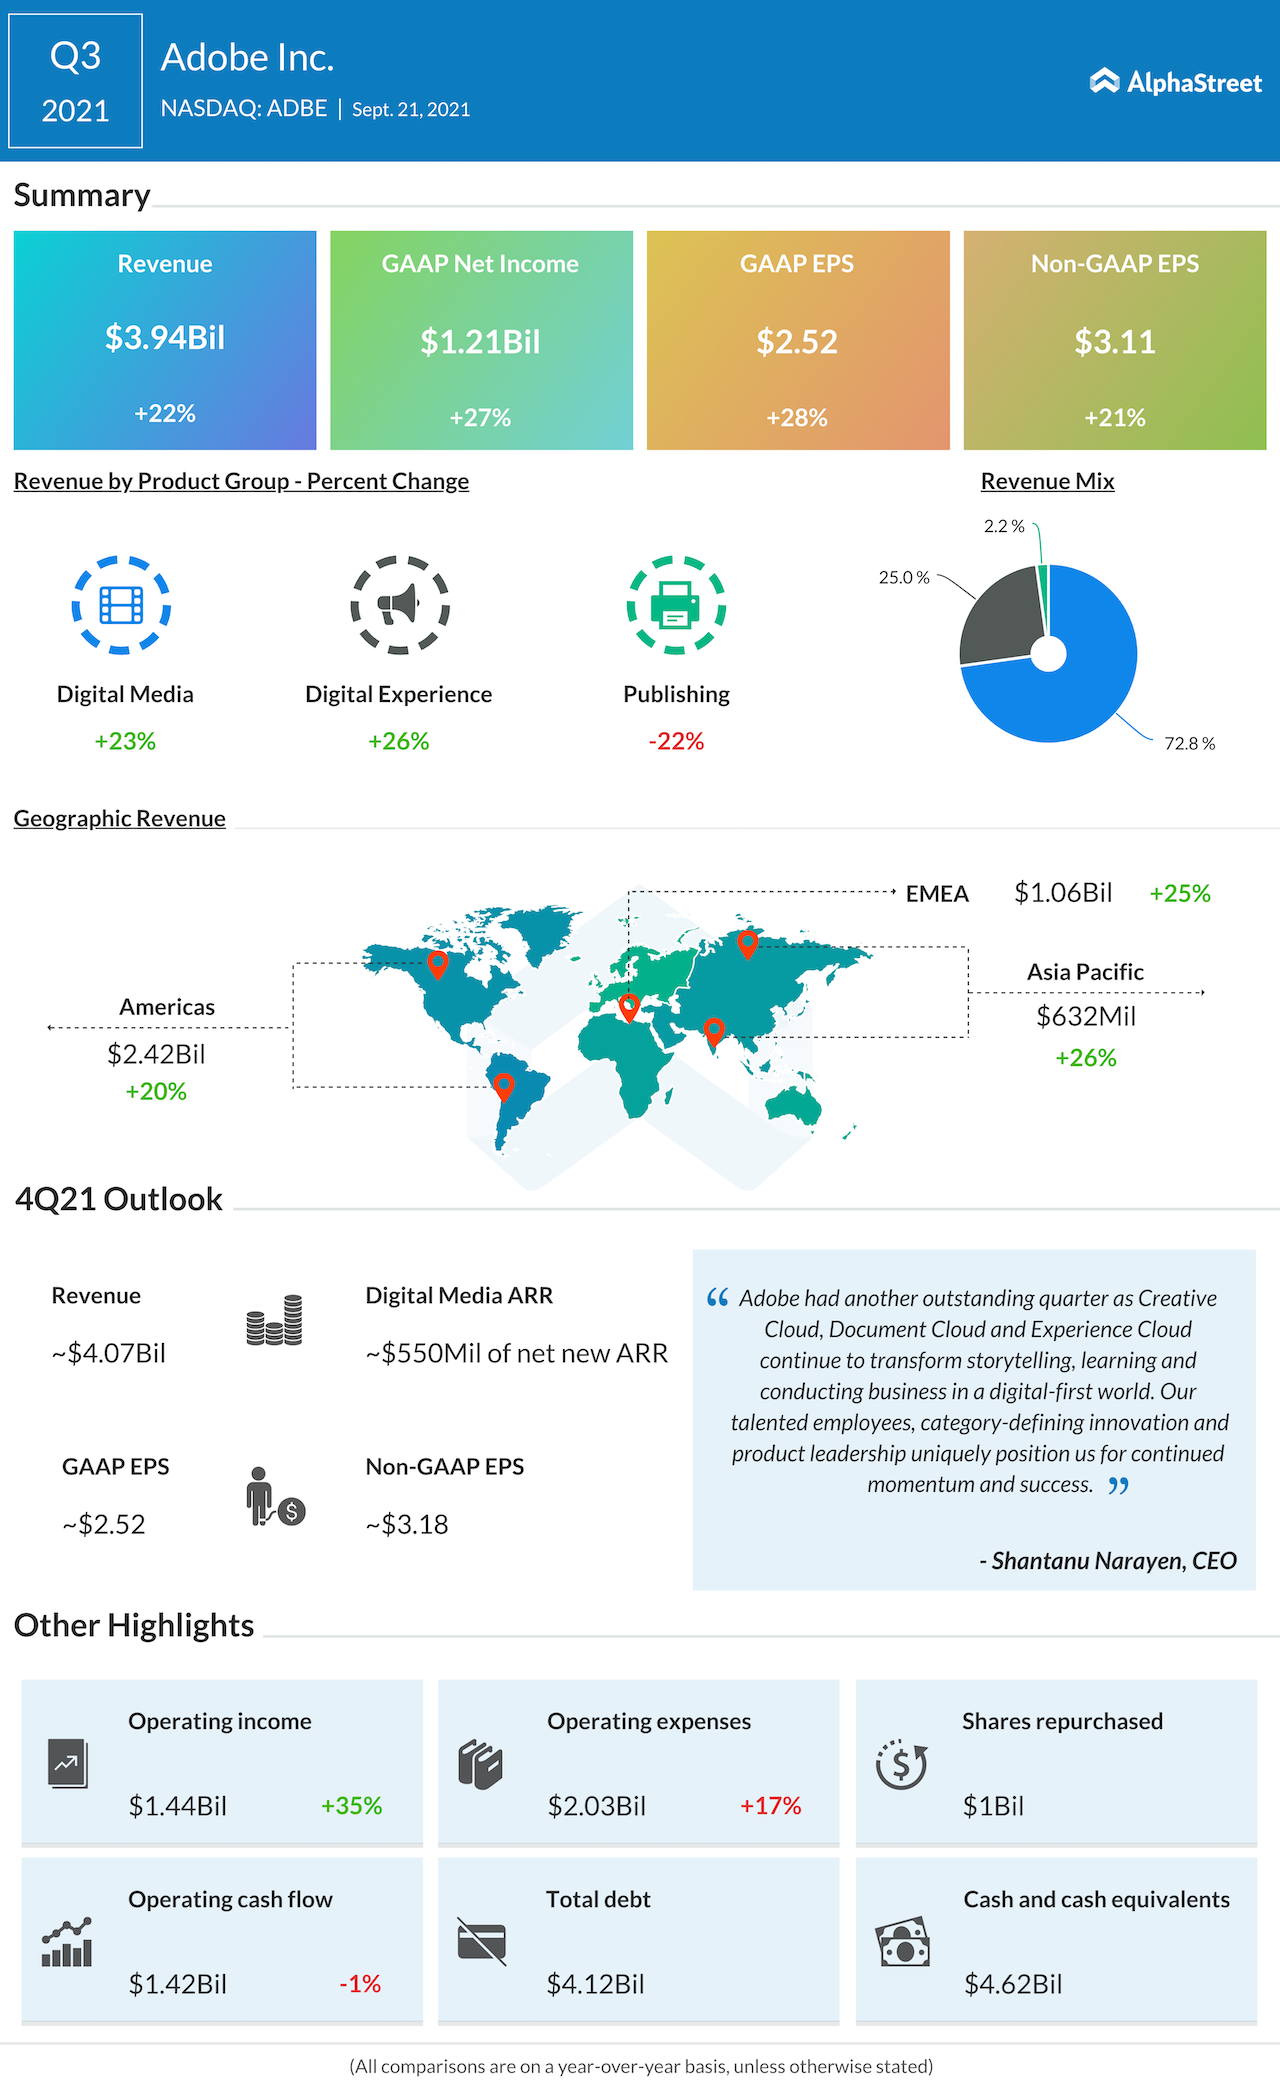 Adobe inc Q3 2021 earnings